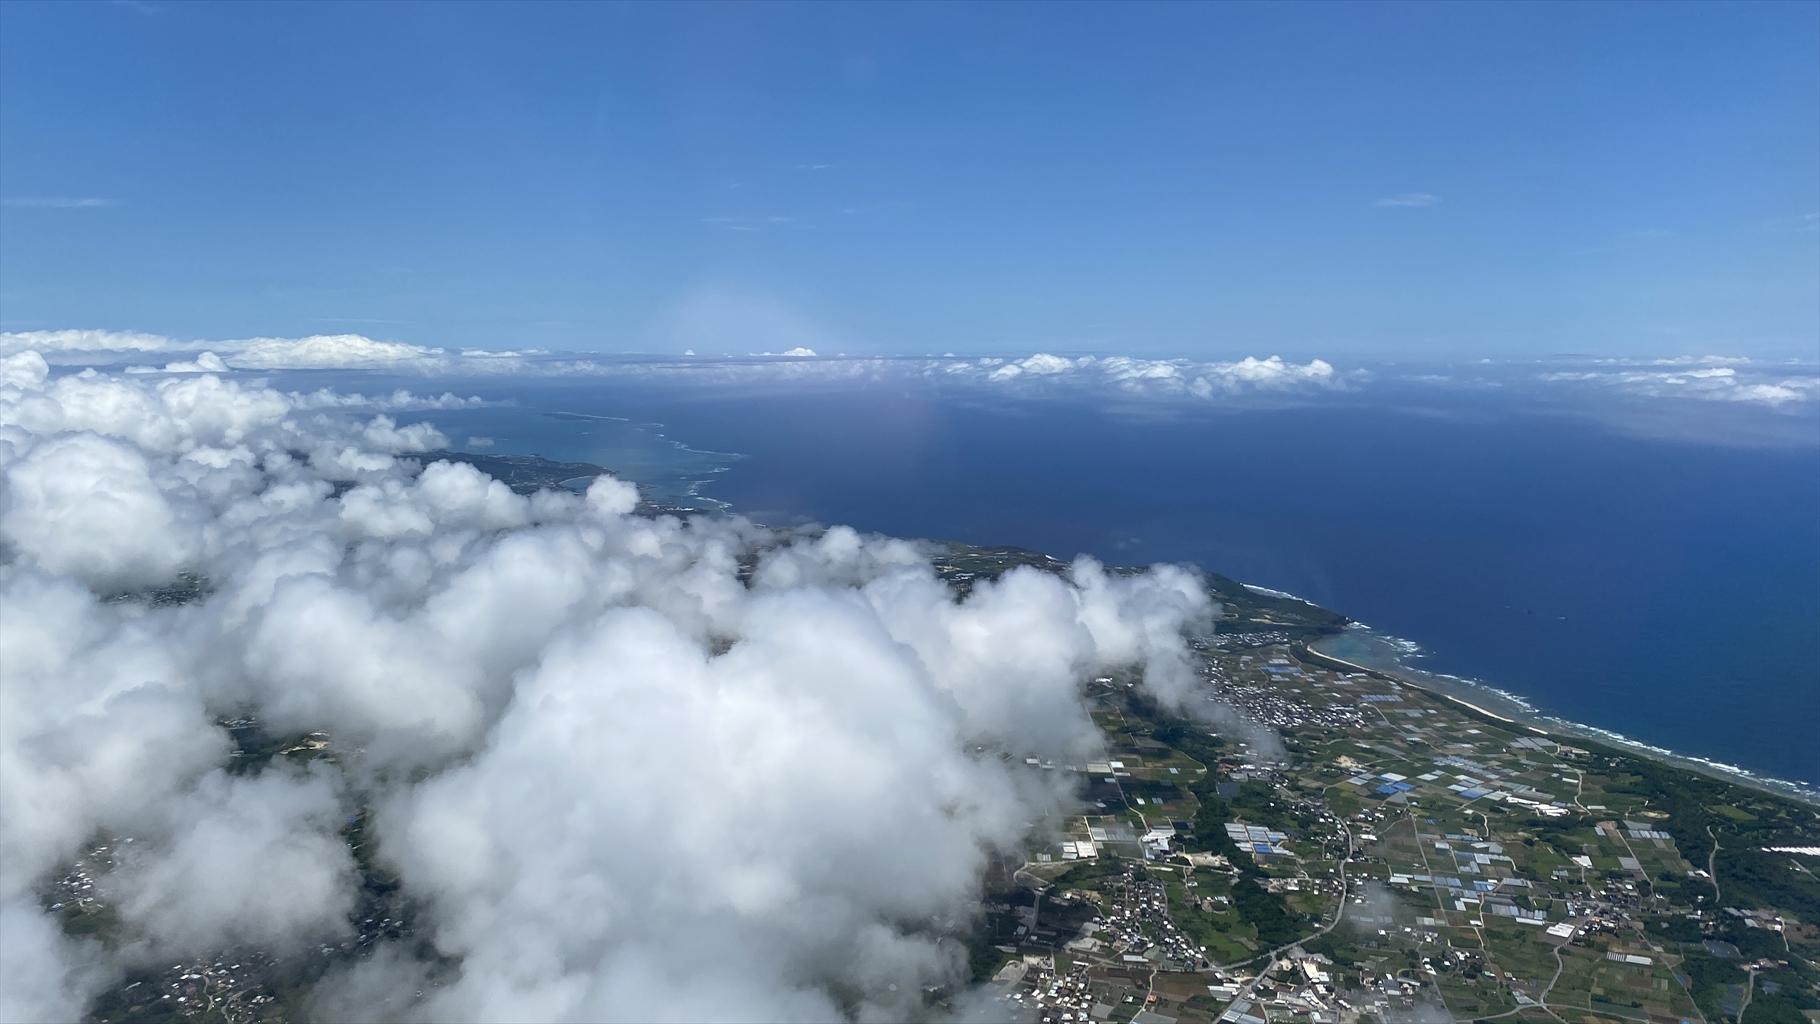 JL904 02JUN21 沖縄(那覇)~羽田 ファーストクラス